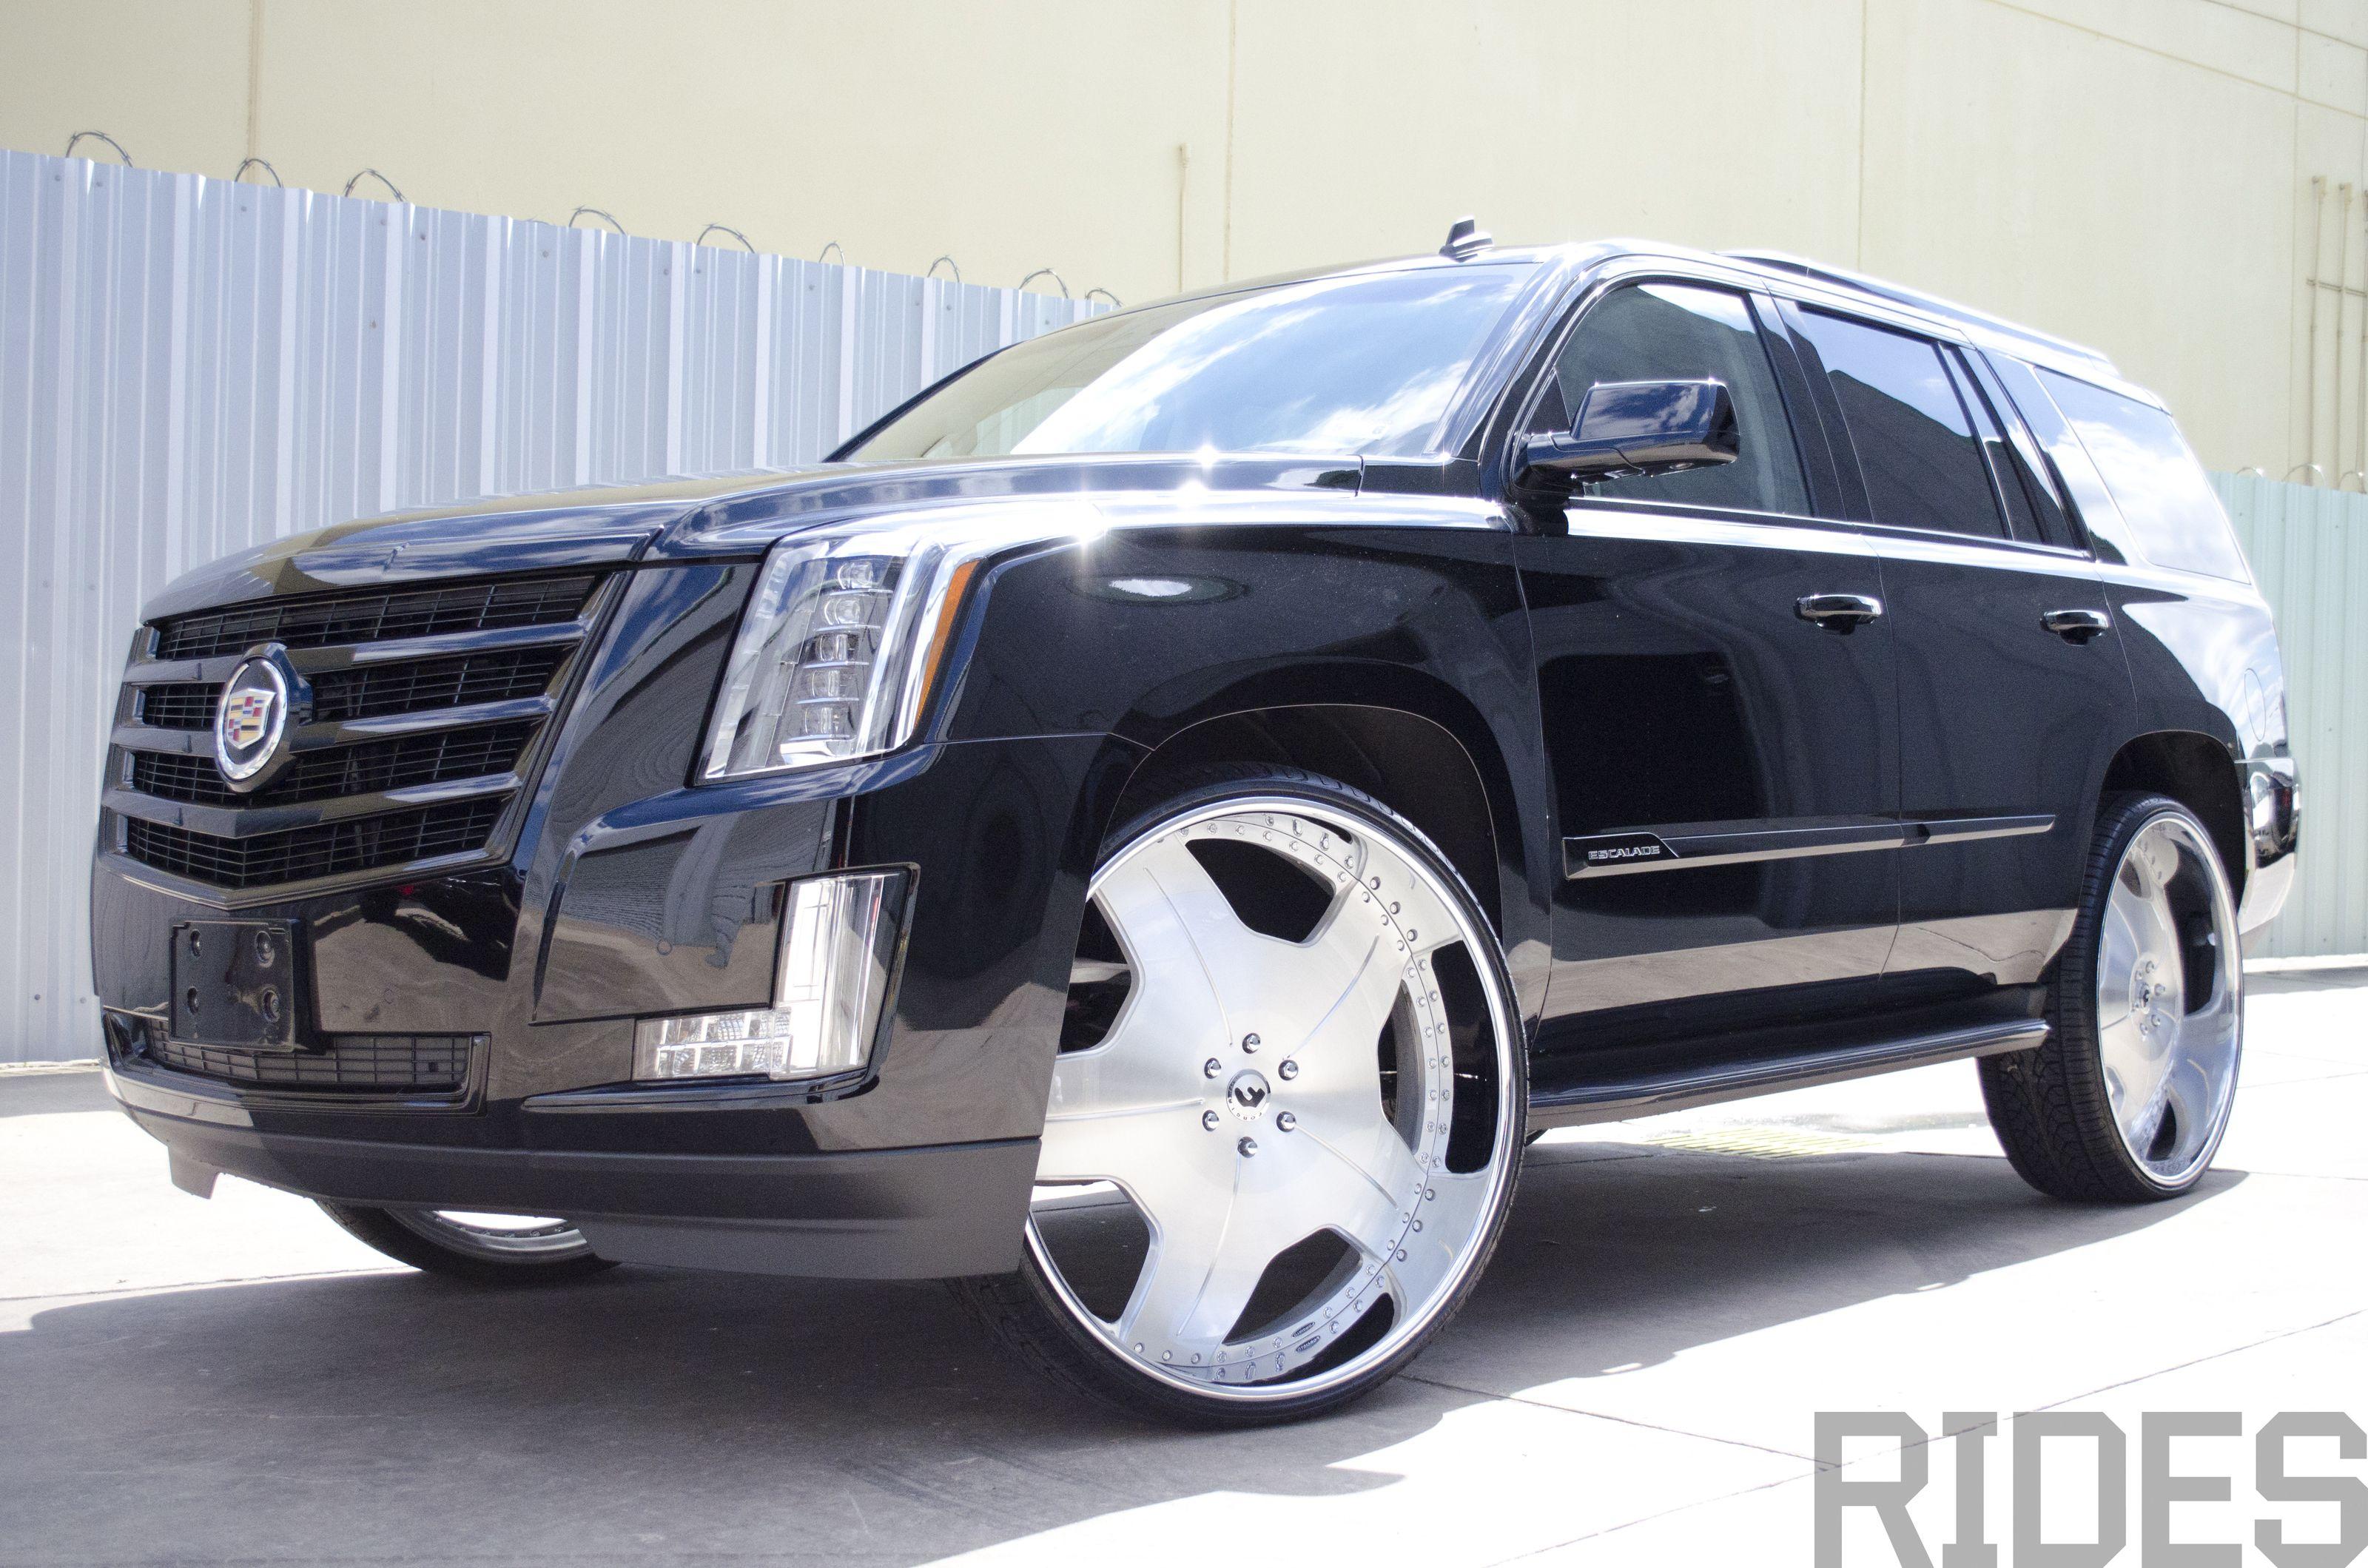 30 Inch Rims On Trucks : Cadillac escalade on inch forgiato wheels rides